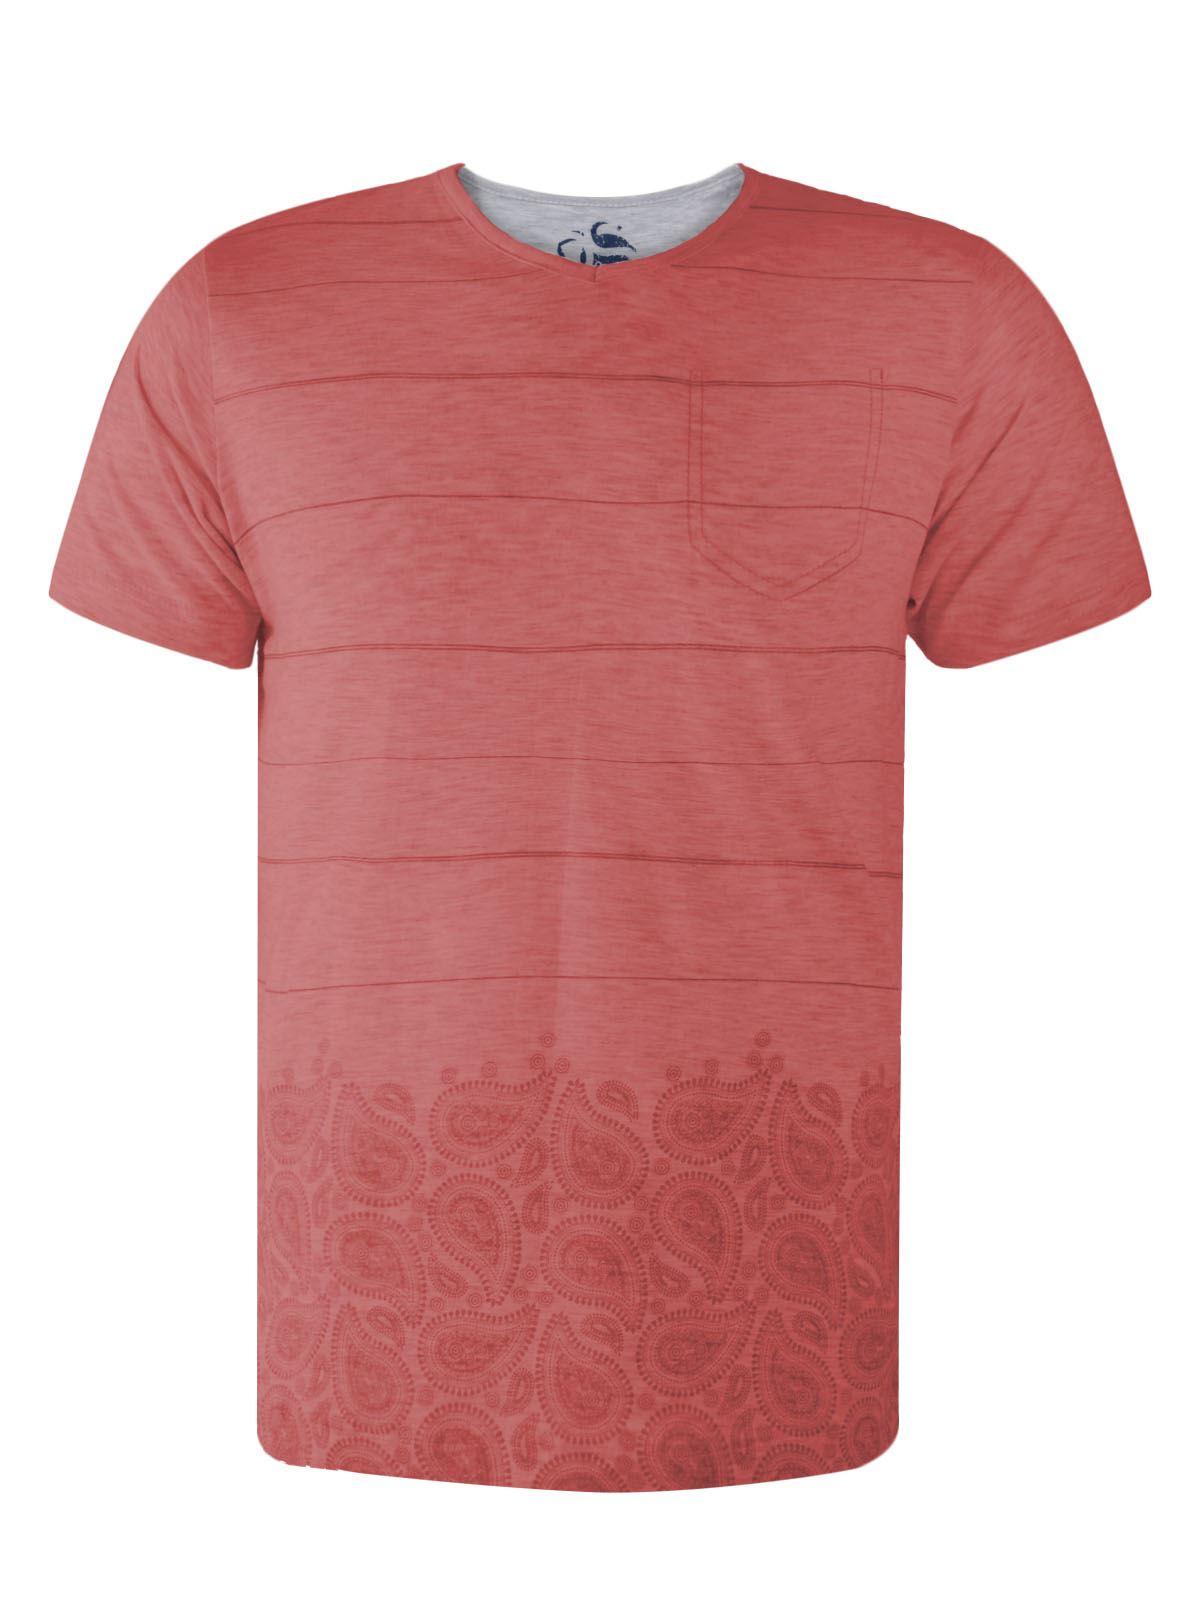 New Mens Fashion Casual Stripe Pocket T Shirt Floral Print